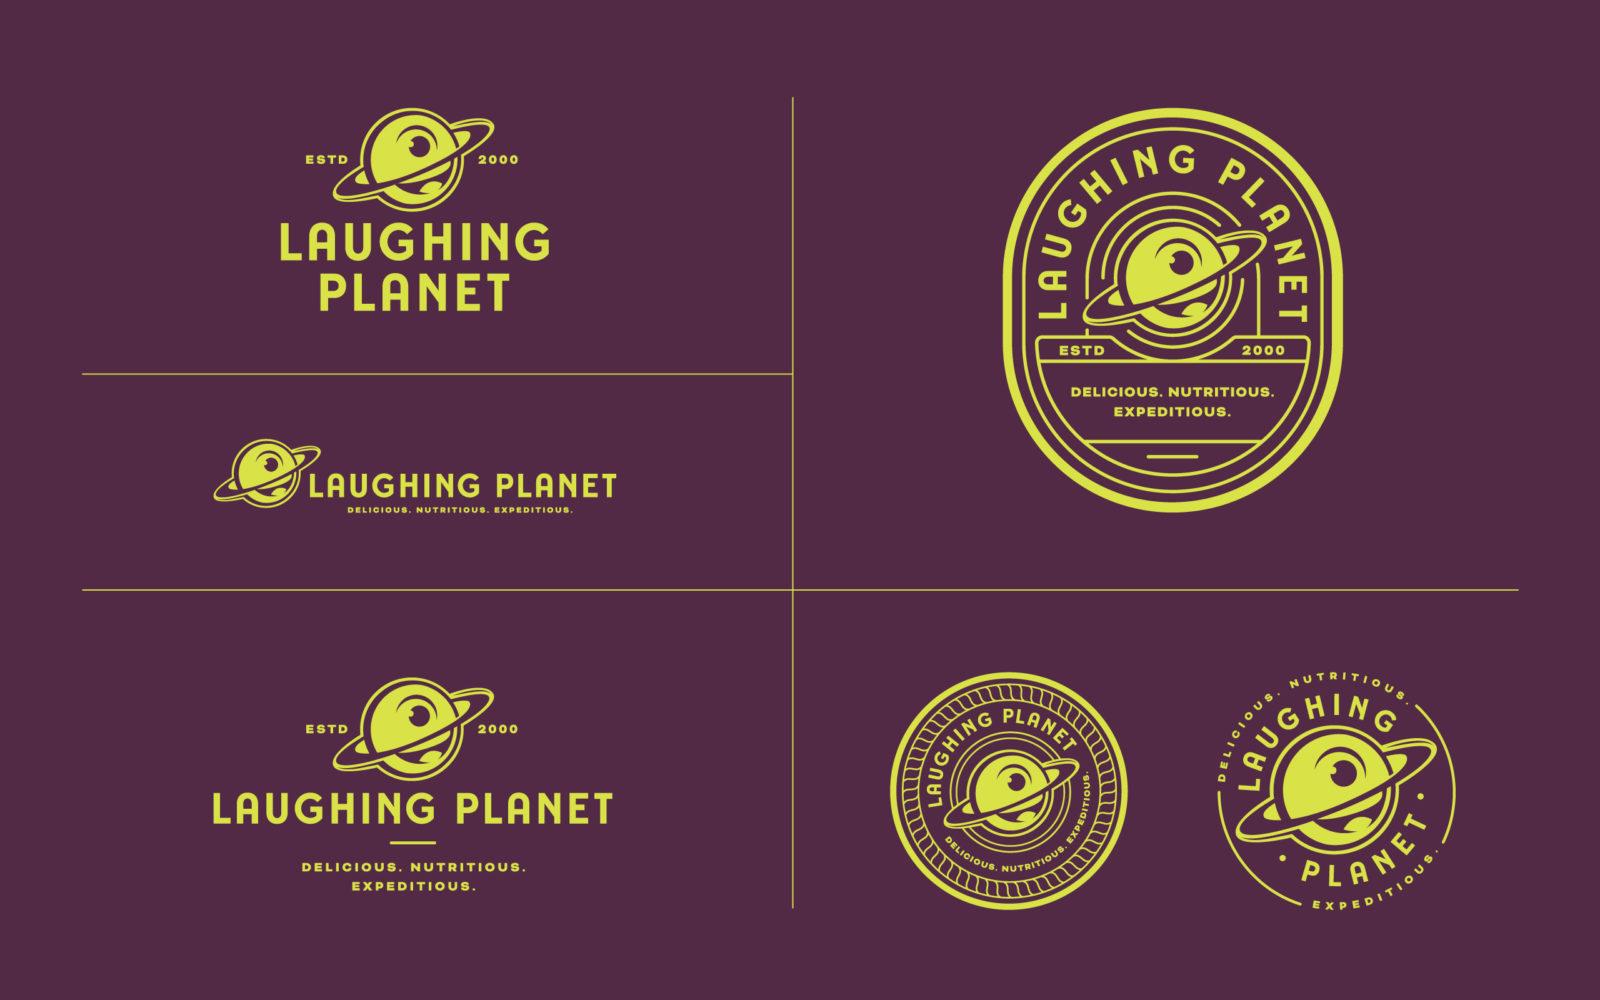 Laughing Planet logo variations